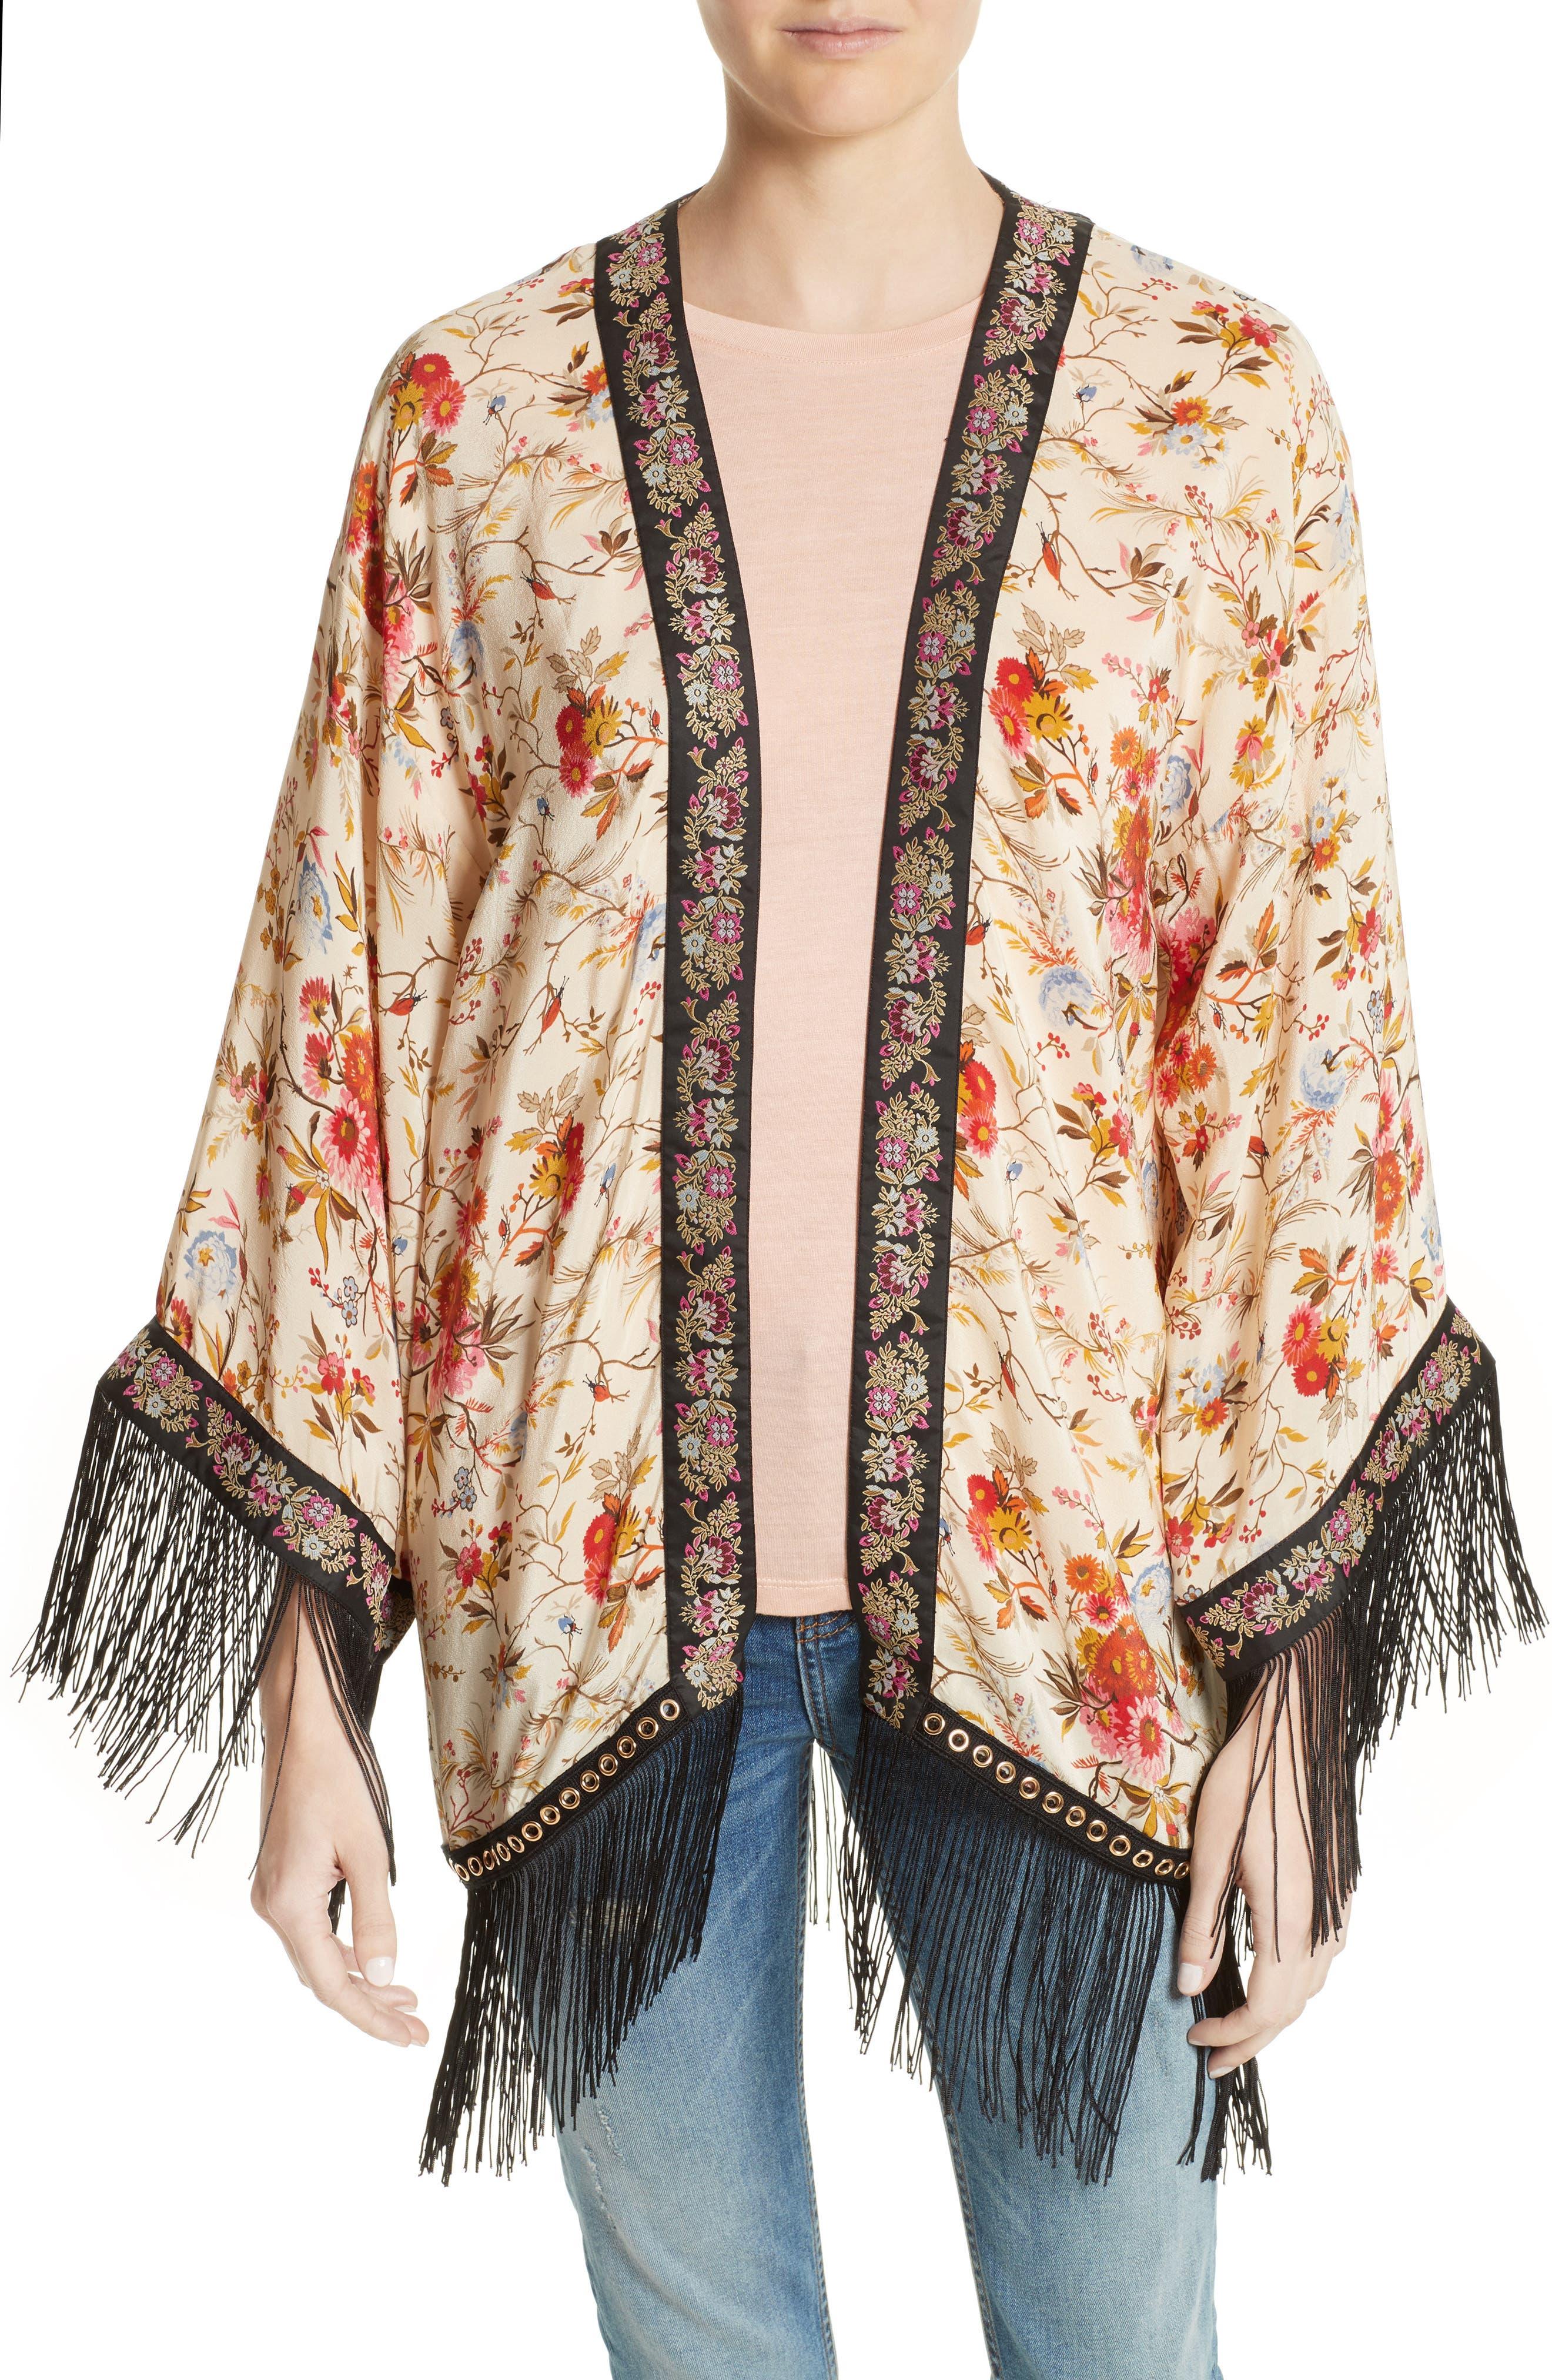 The Kooples Fleurs D'Artifice Floral Print Fringe Kimono